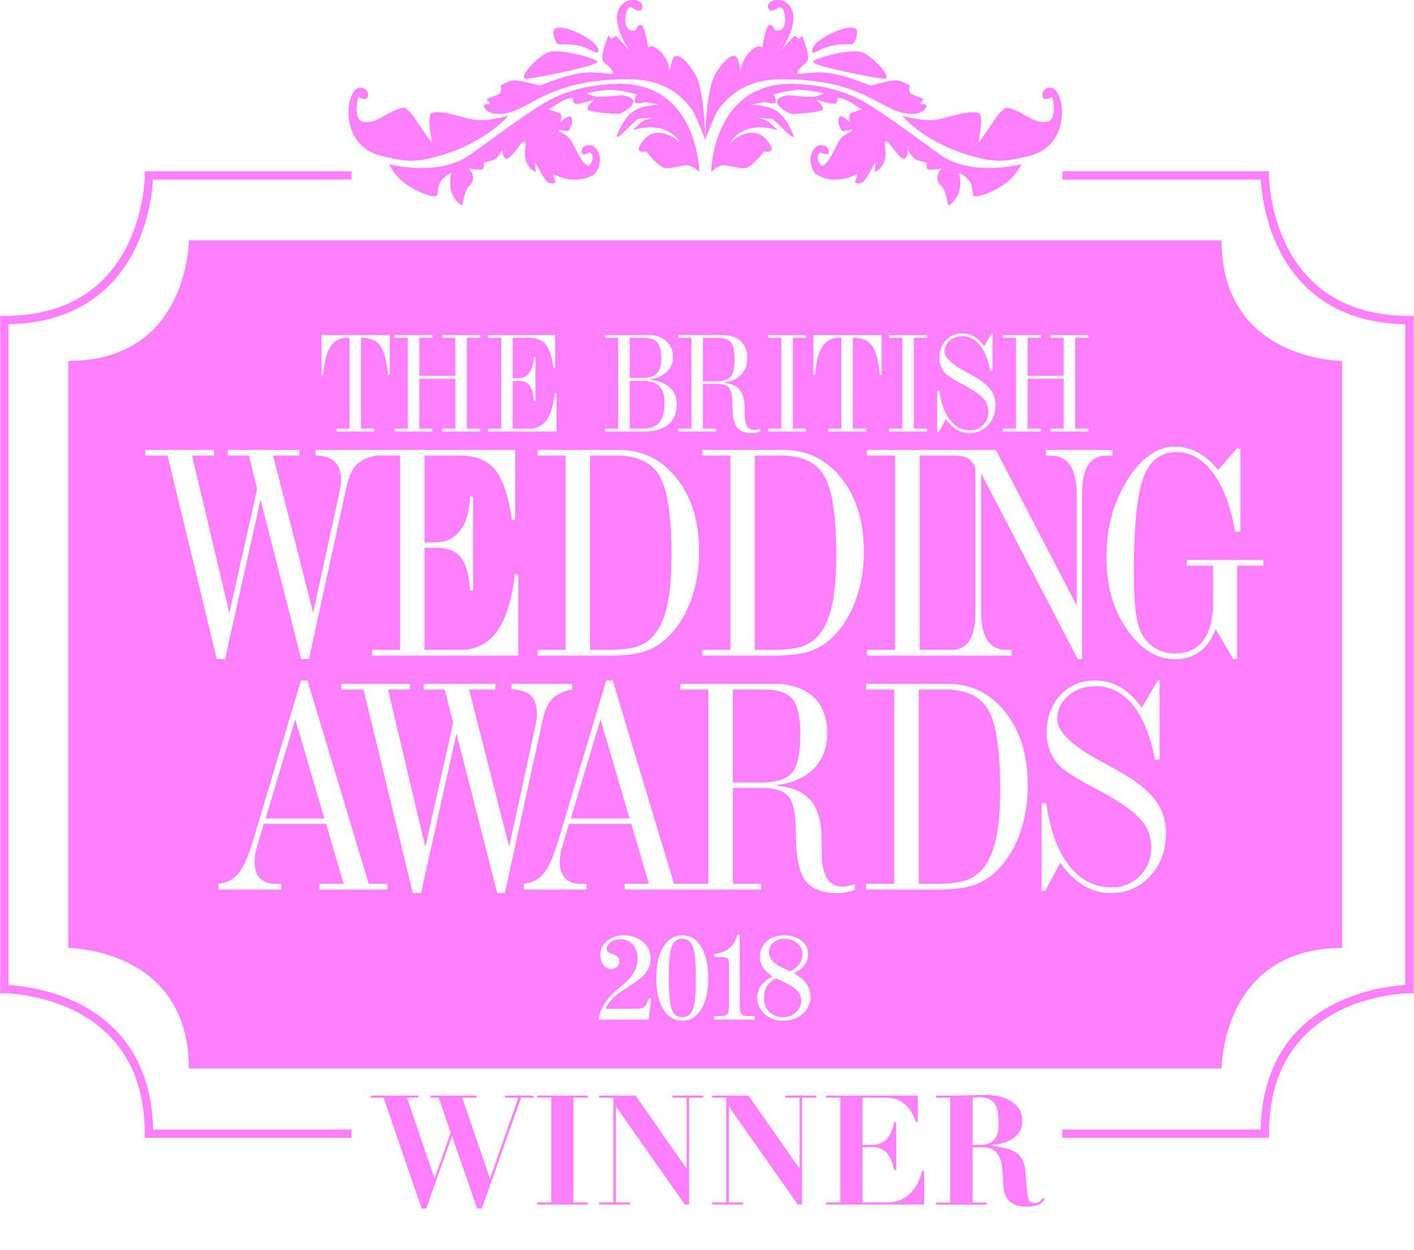 Winners of British Wedding Awards Best Newcomer 2018